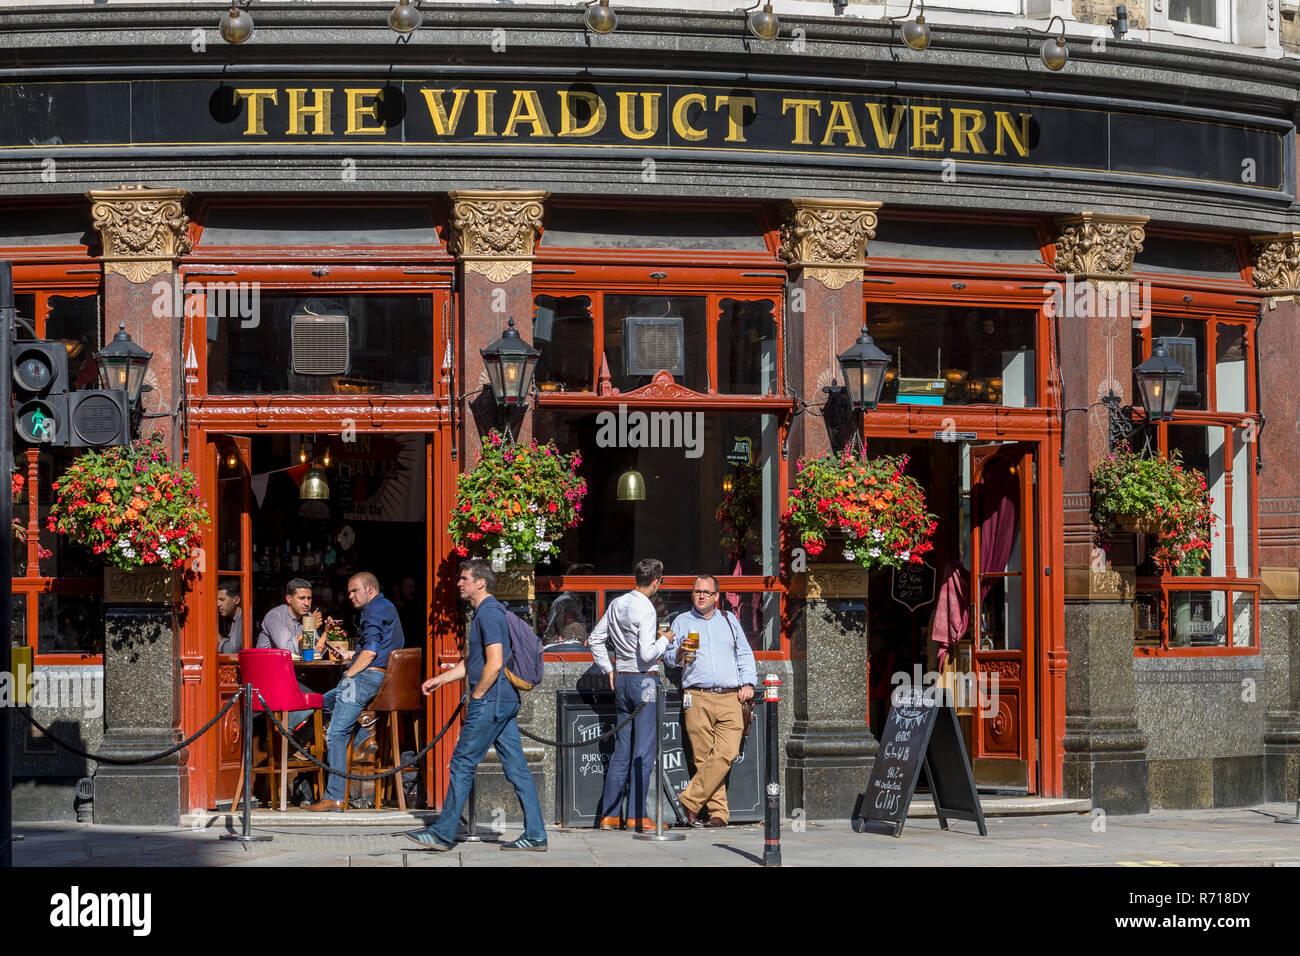 Famous and listed pub The Viaduct Tavern, Holborn, London, United Kingdom - Stock Image